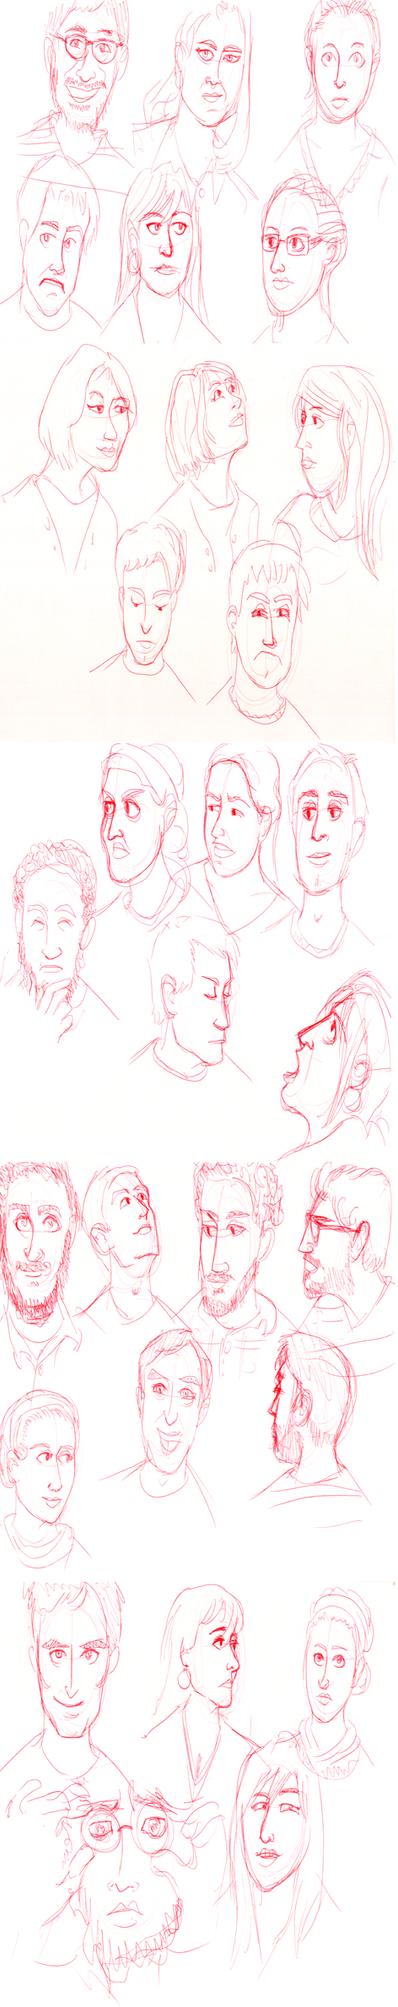 Expressions Sketch Dump by bagasuit091